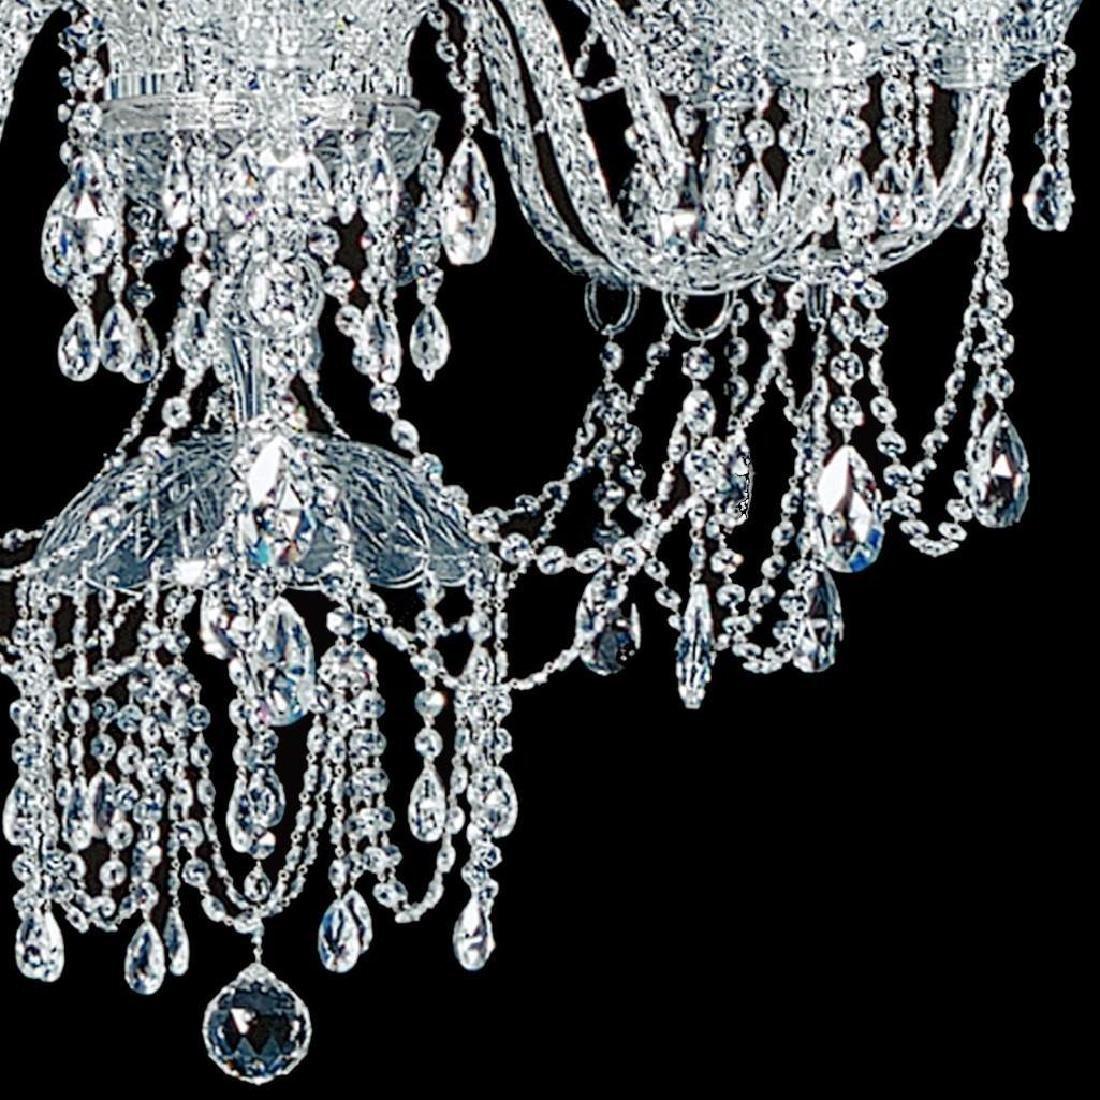 Winter Elegance - 16 Light Crystal Chandelier with - 3